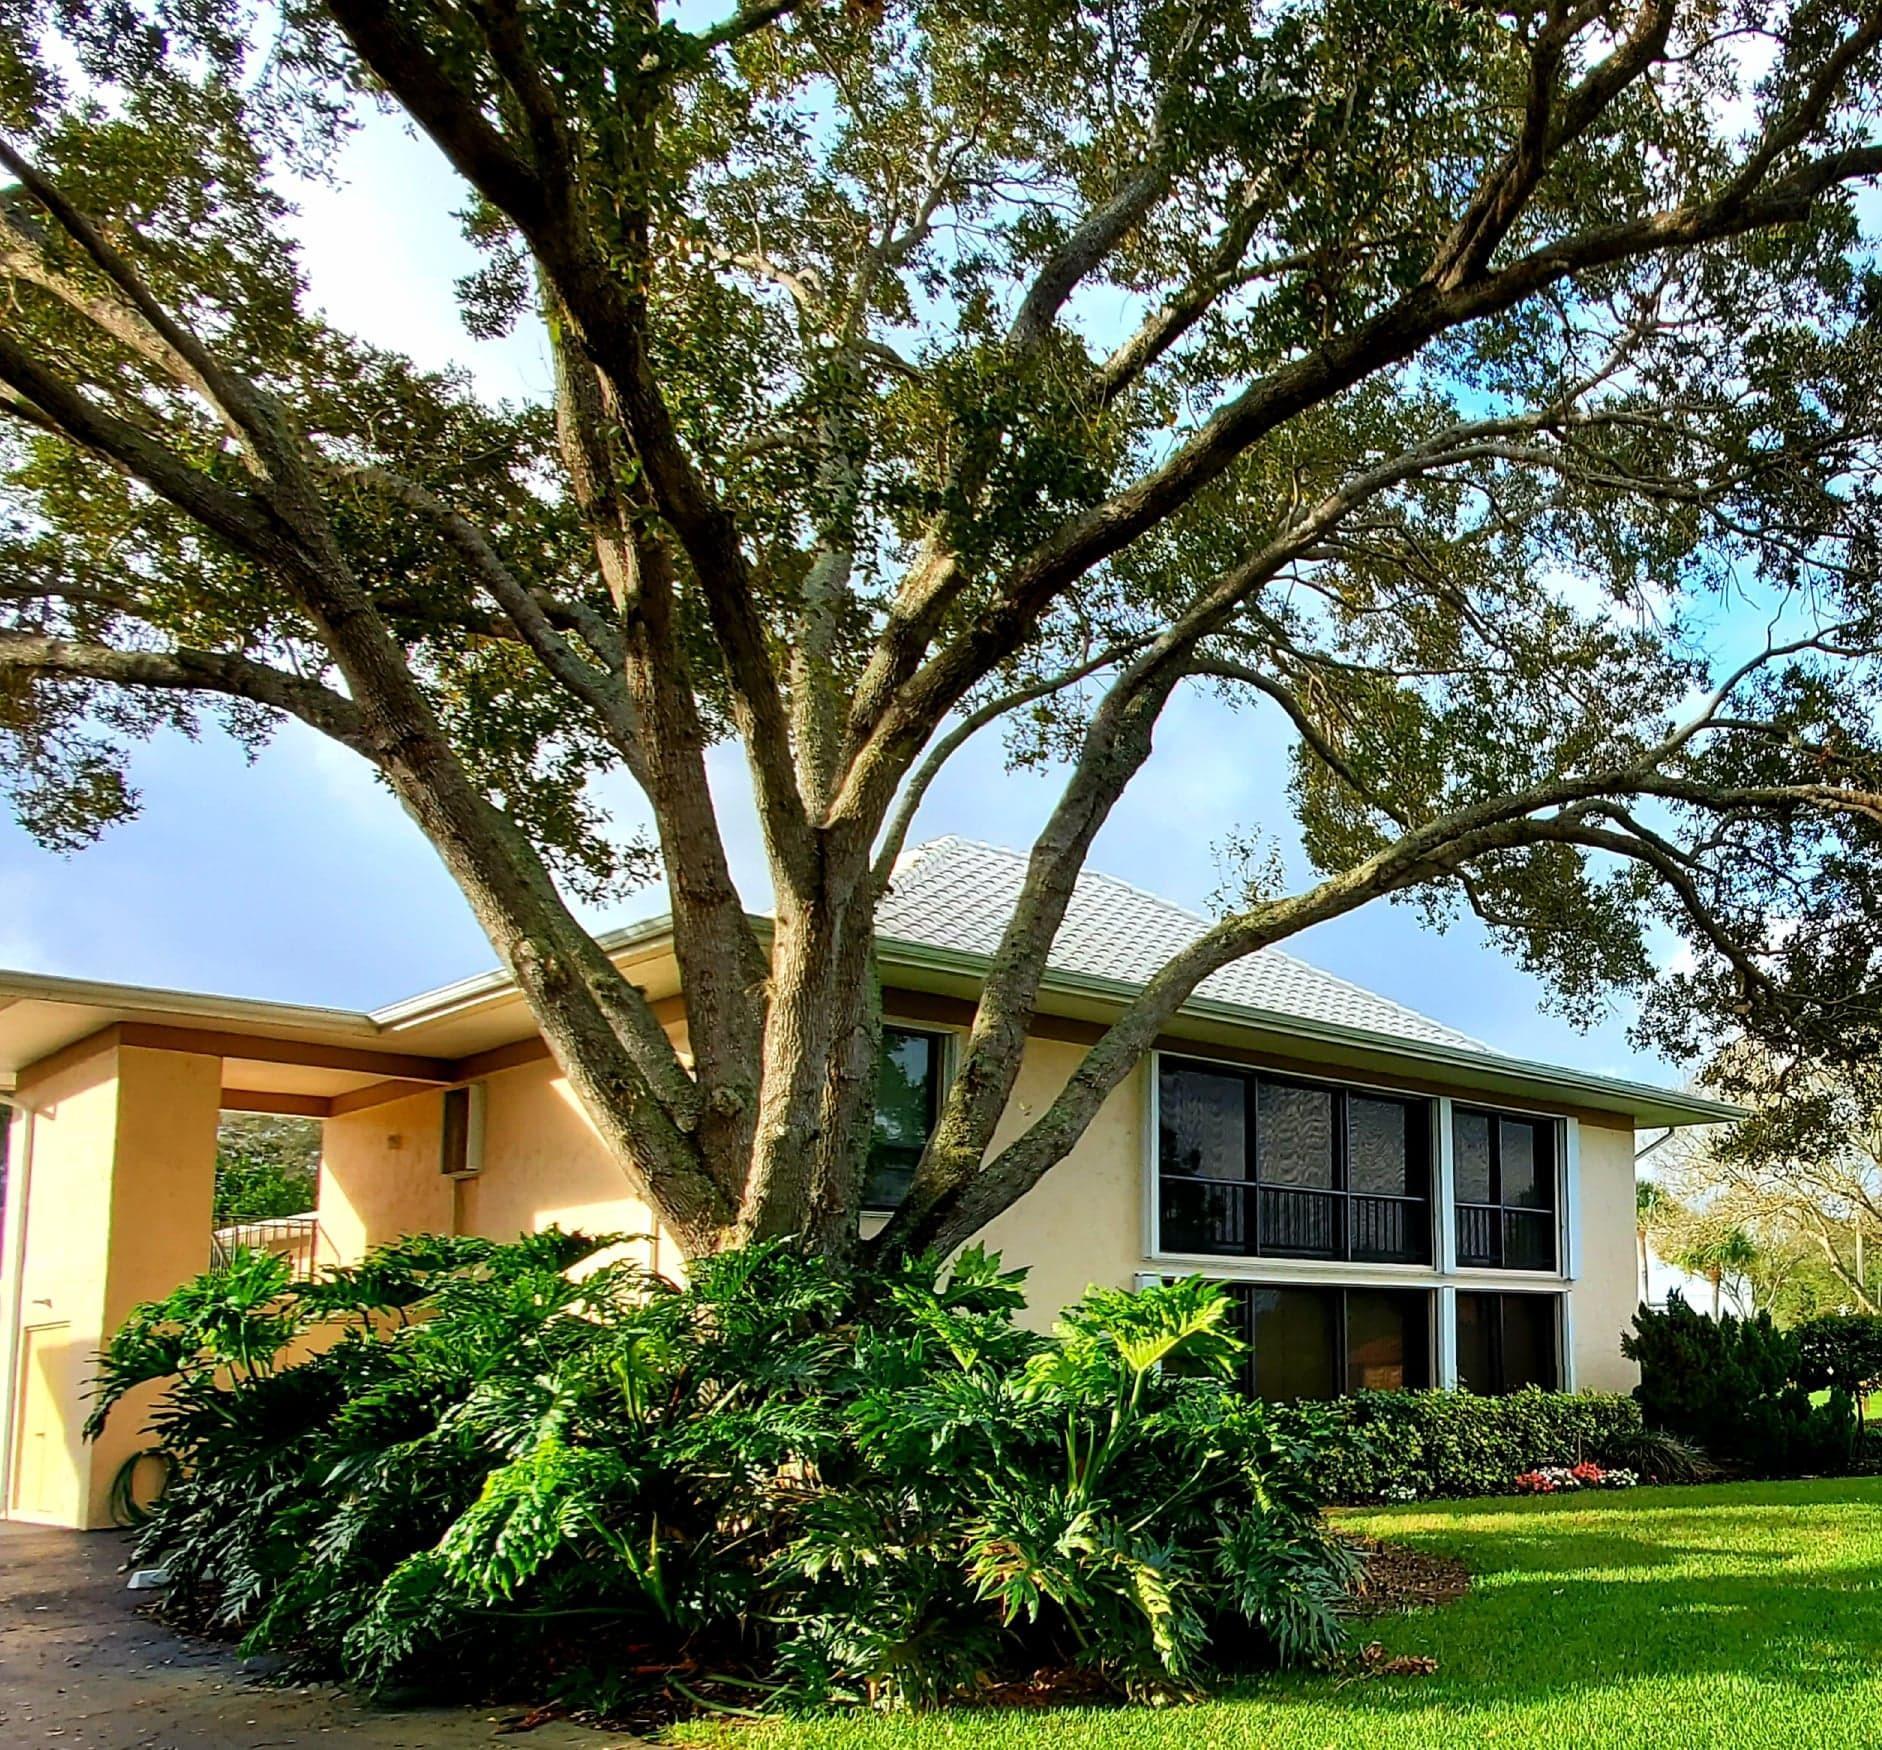 16 Turtle Creek Drive 16-A, Tequesta, Florida 33469, 3 Bedrooms Bedrooms, ,2 BathroomsBathrooms,F,Condominium,Turtle Creek,RX-10609501